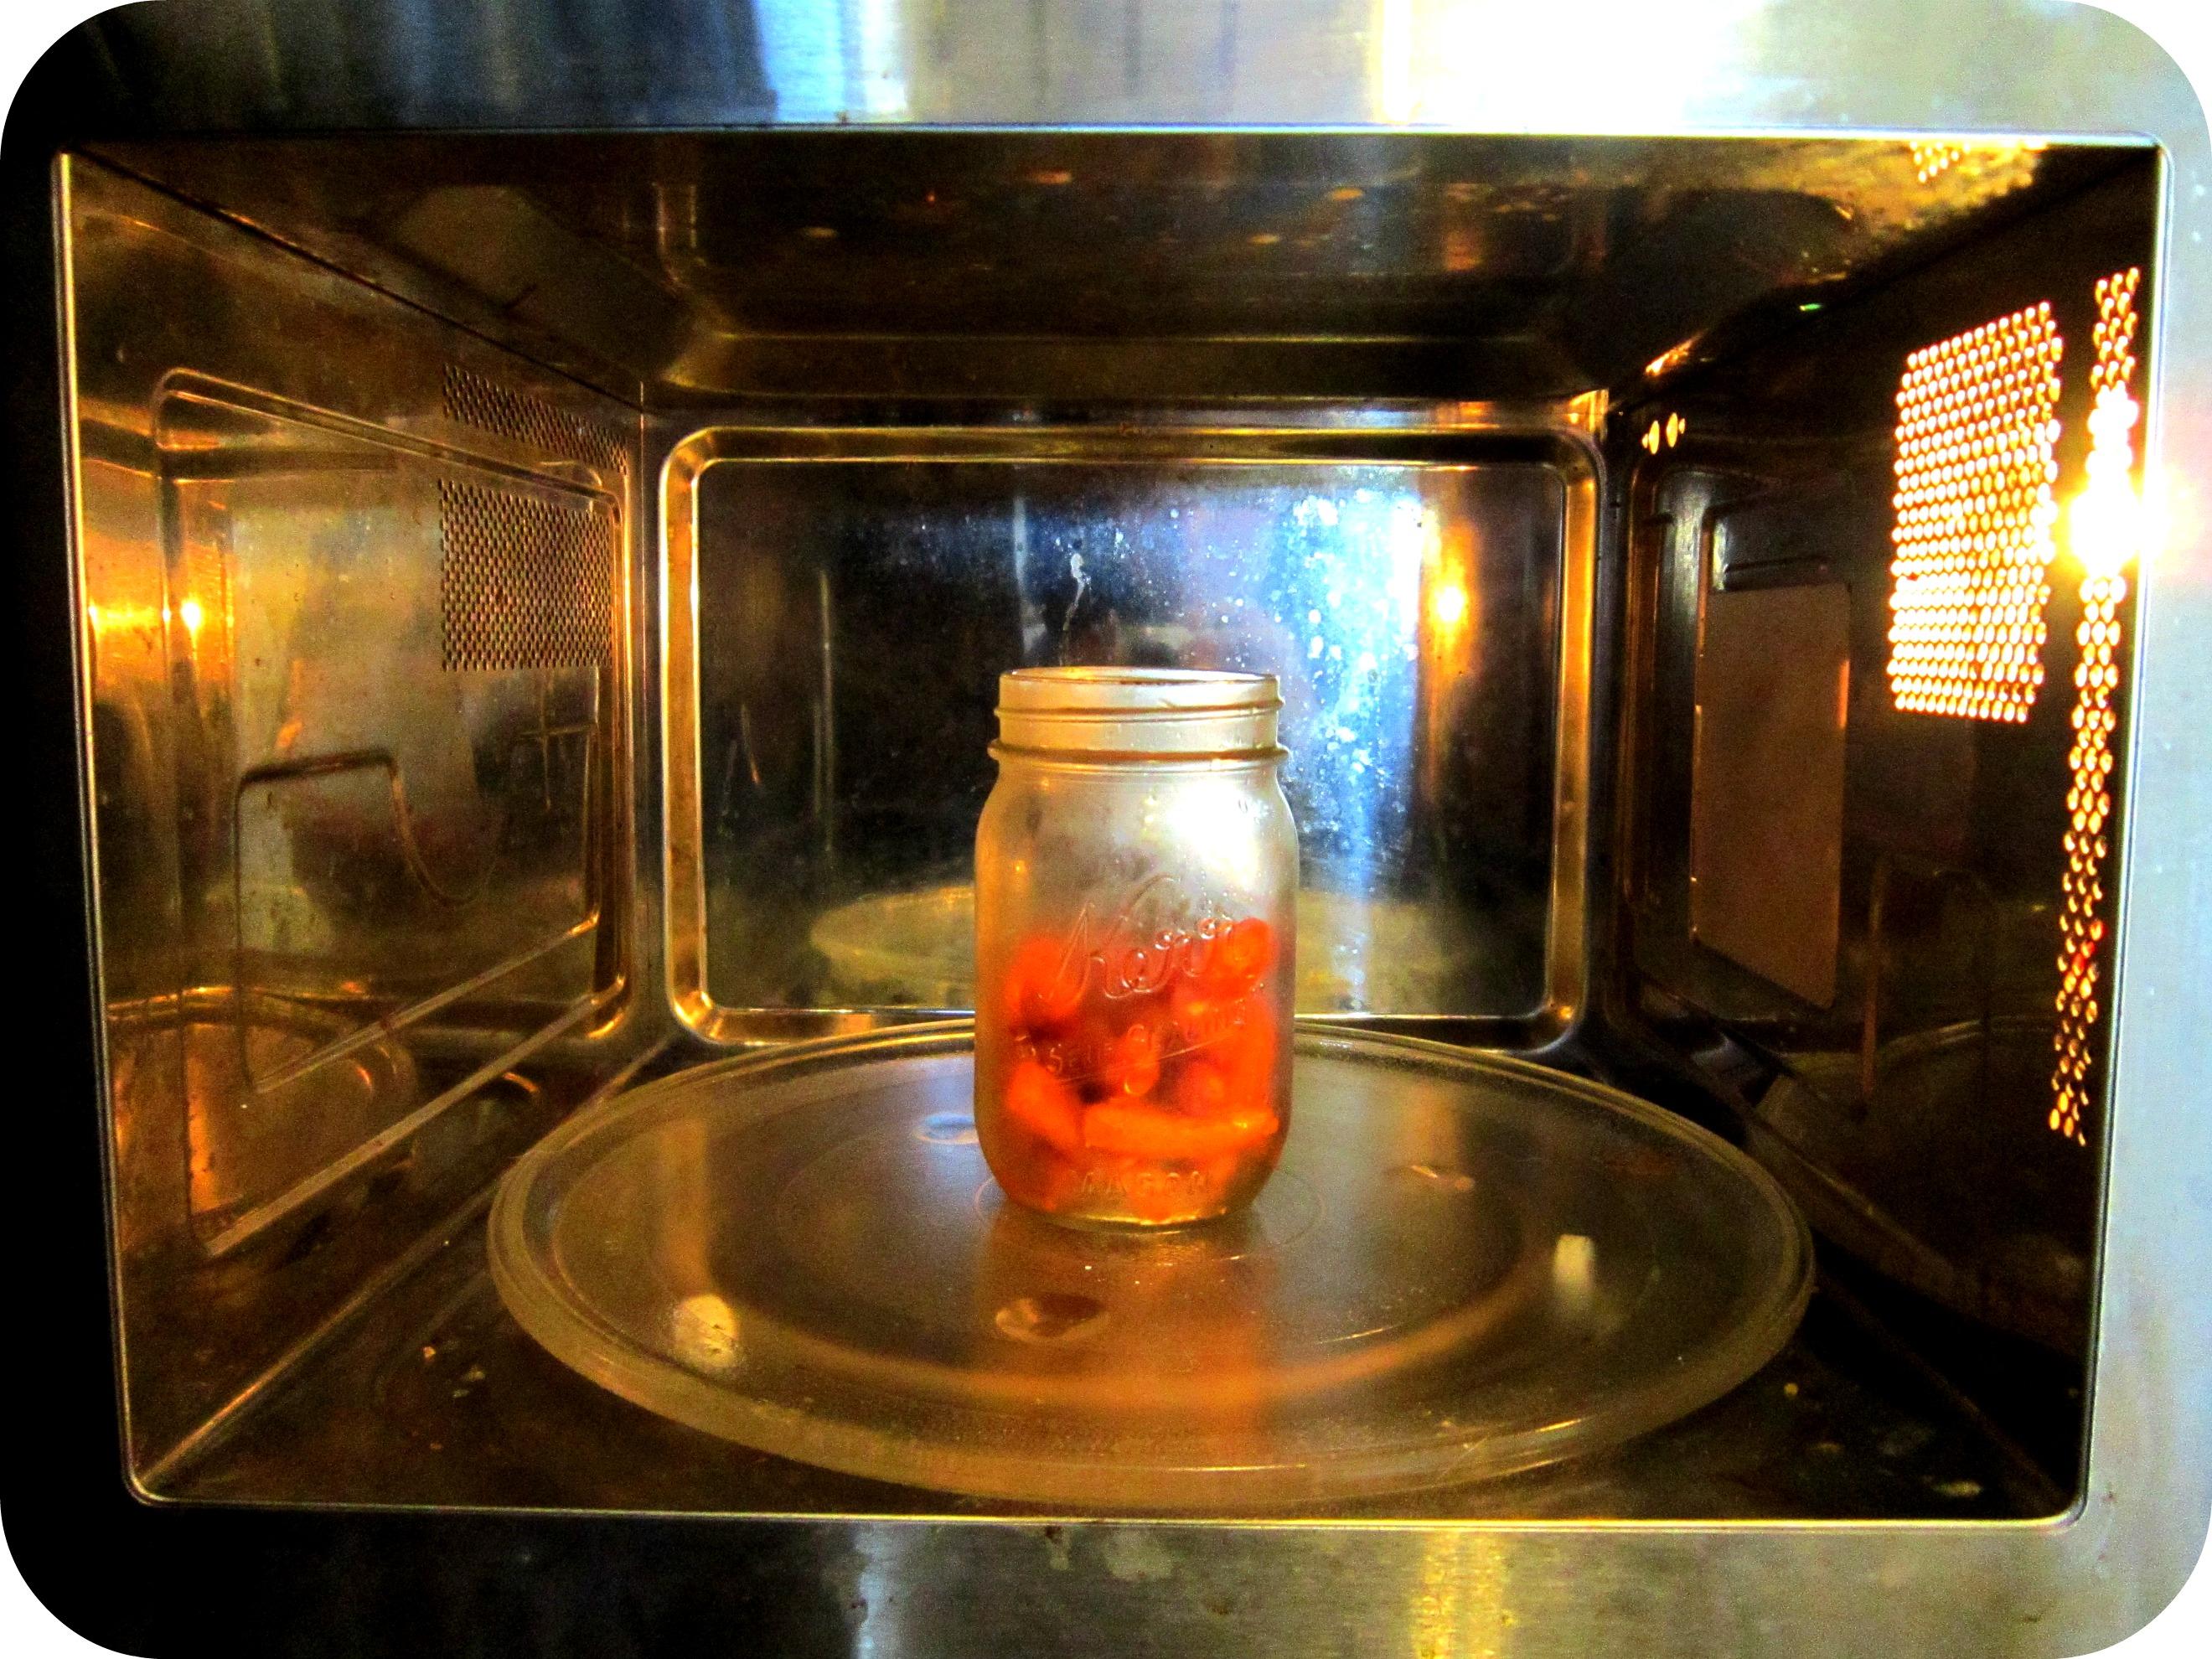 Groovy How To Decrystallize Honey Gbd Healthy Times You Microwave Mason Jars Can You Use Mason Jars Microwave Can You Microwave View Like To Buy World A Mason Jar Beans nice food Can You Microwave Mason Jars